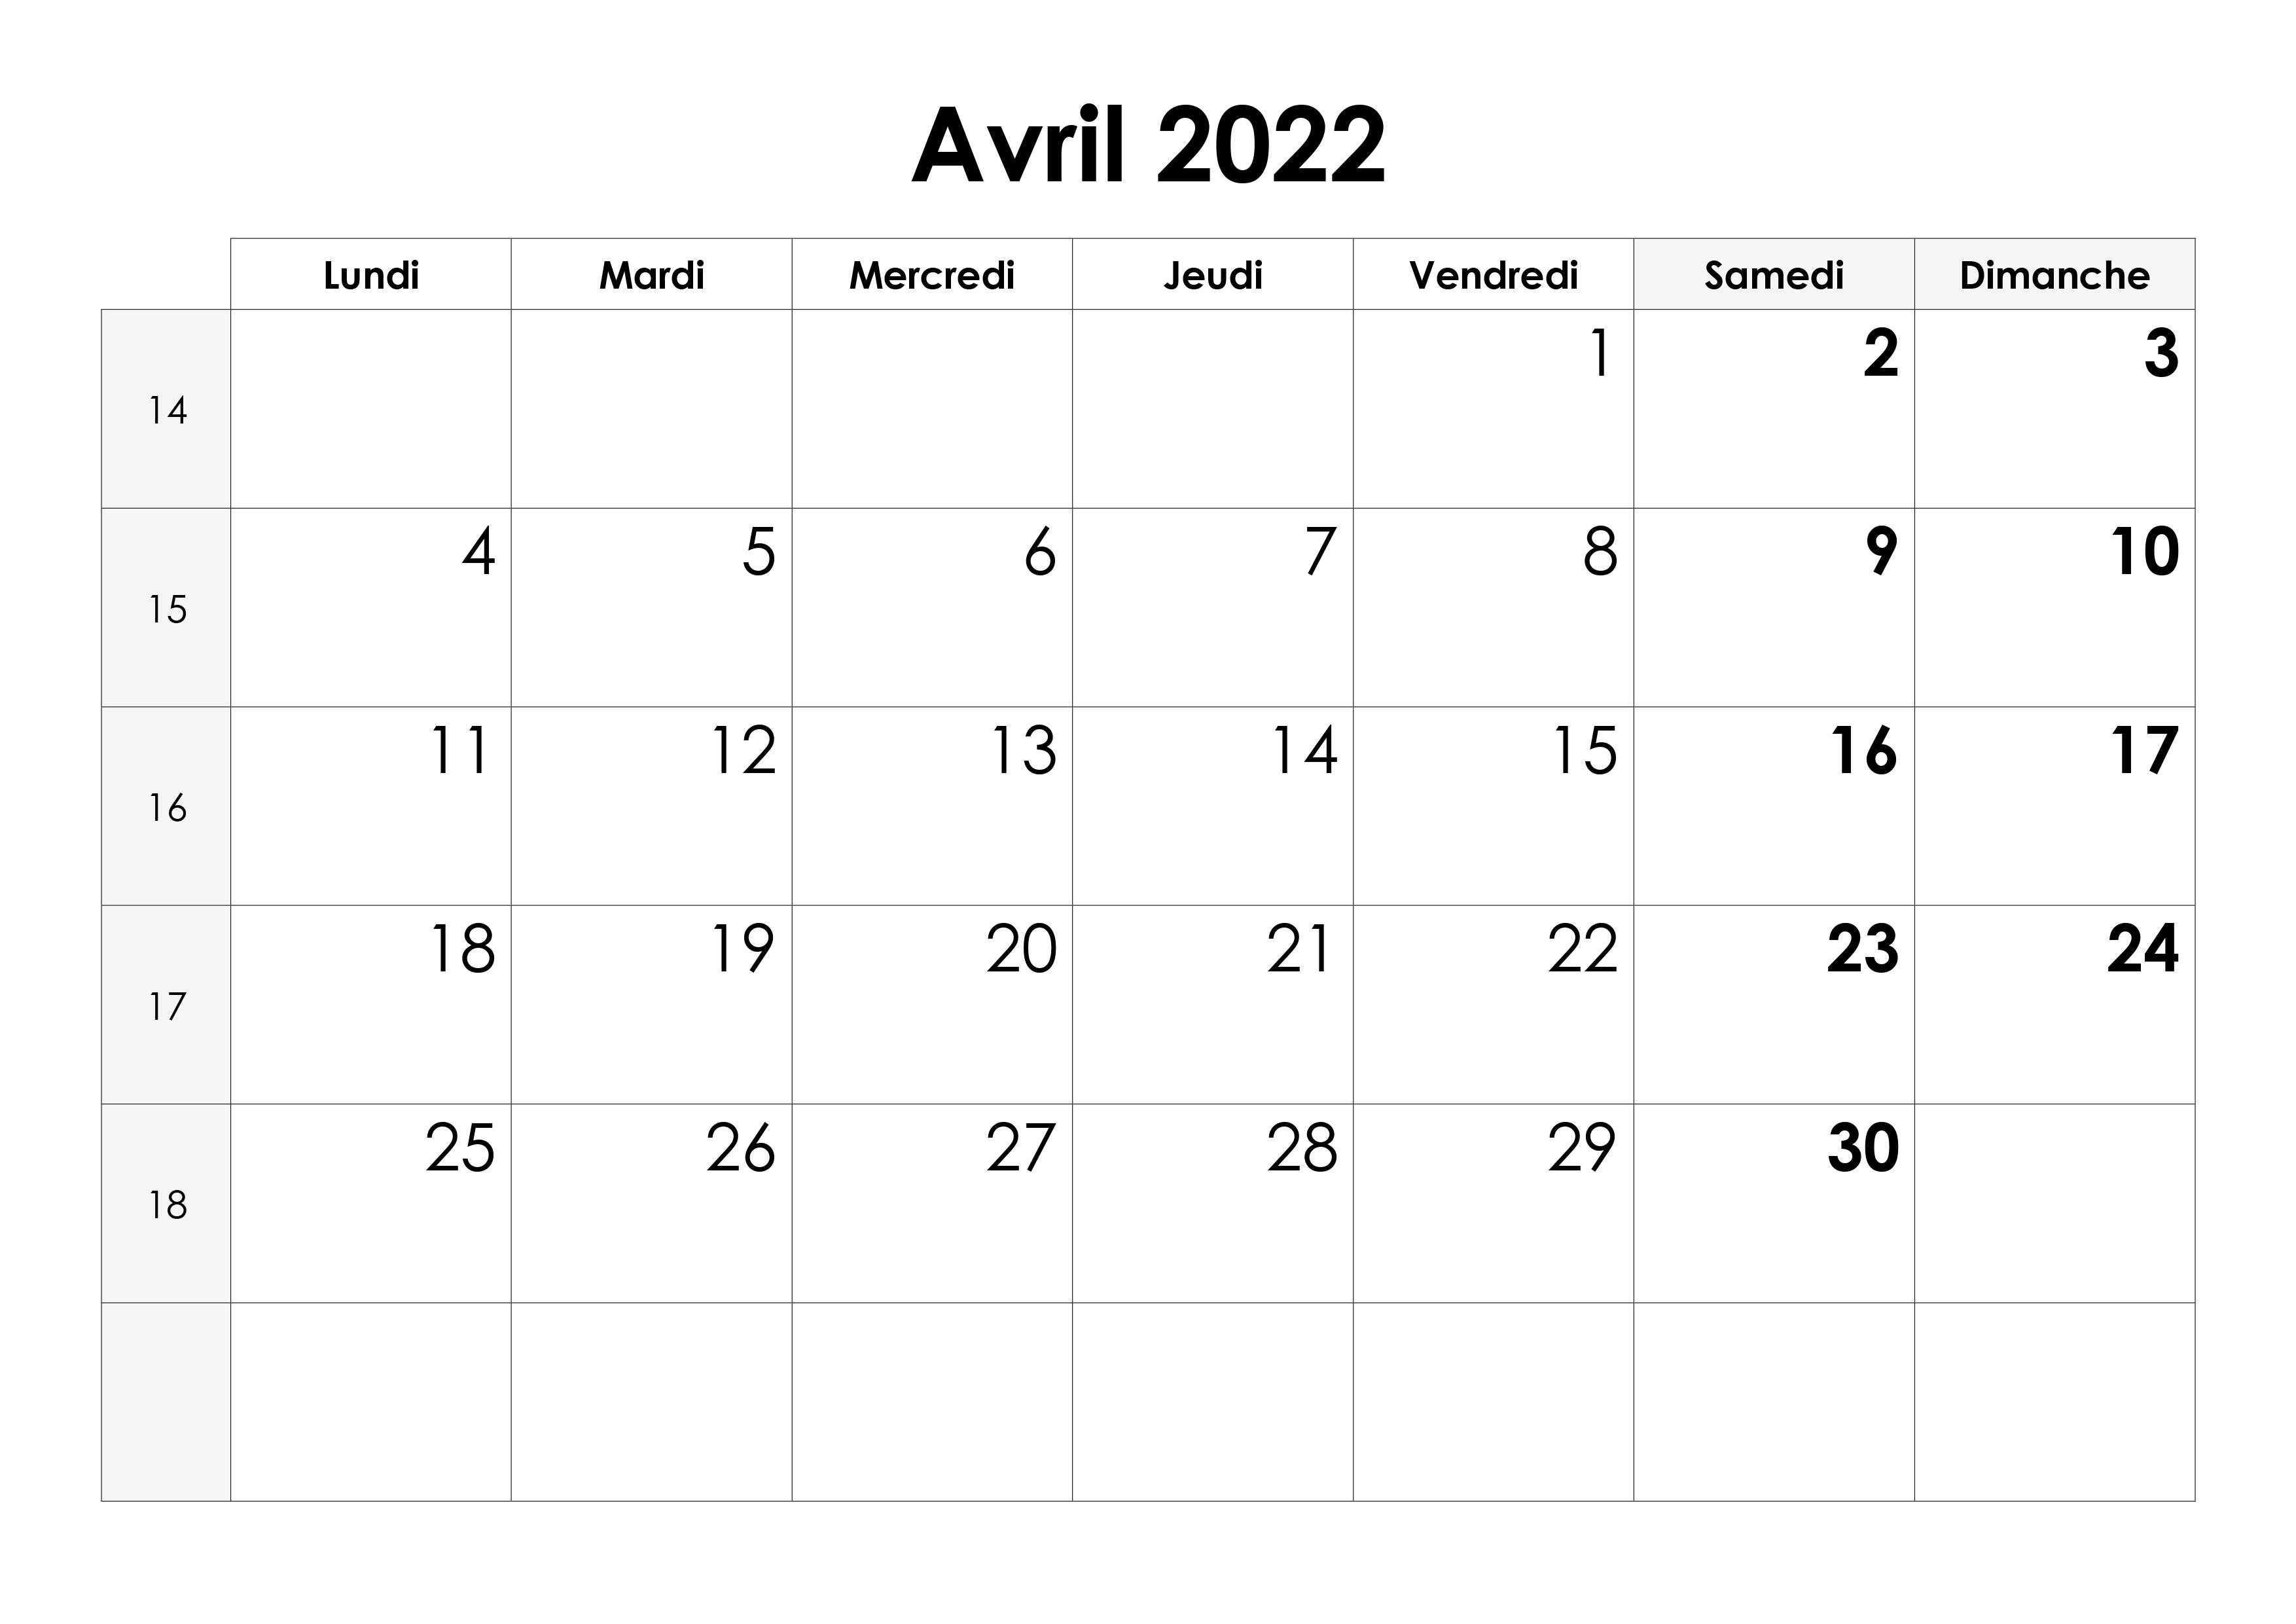 Calendrier Avril 2022 Pdf Calendrier avril 2022 – calendrier.su